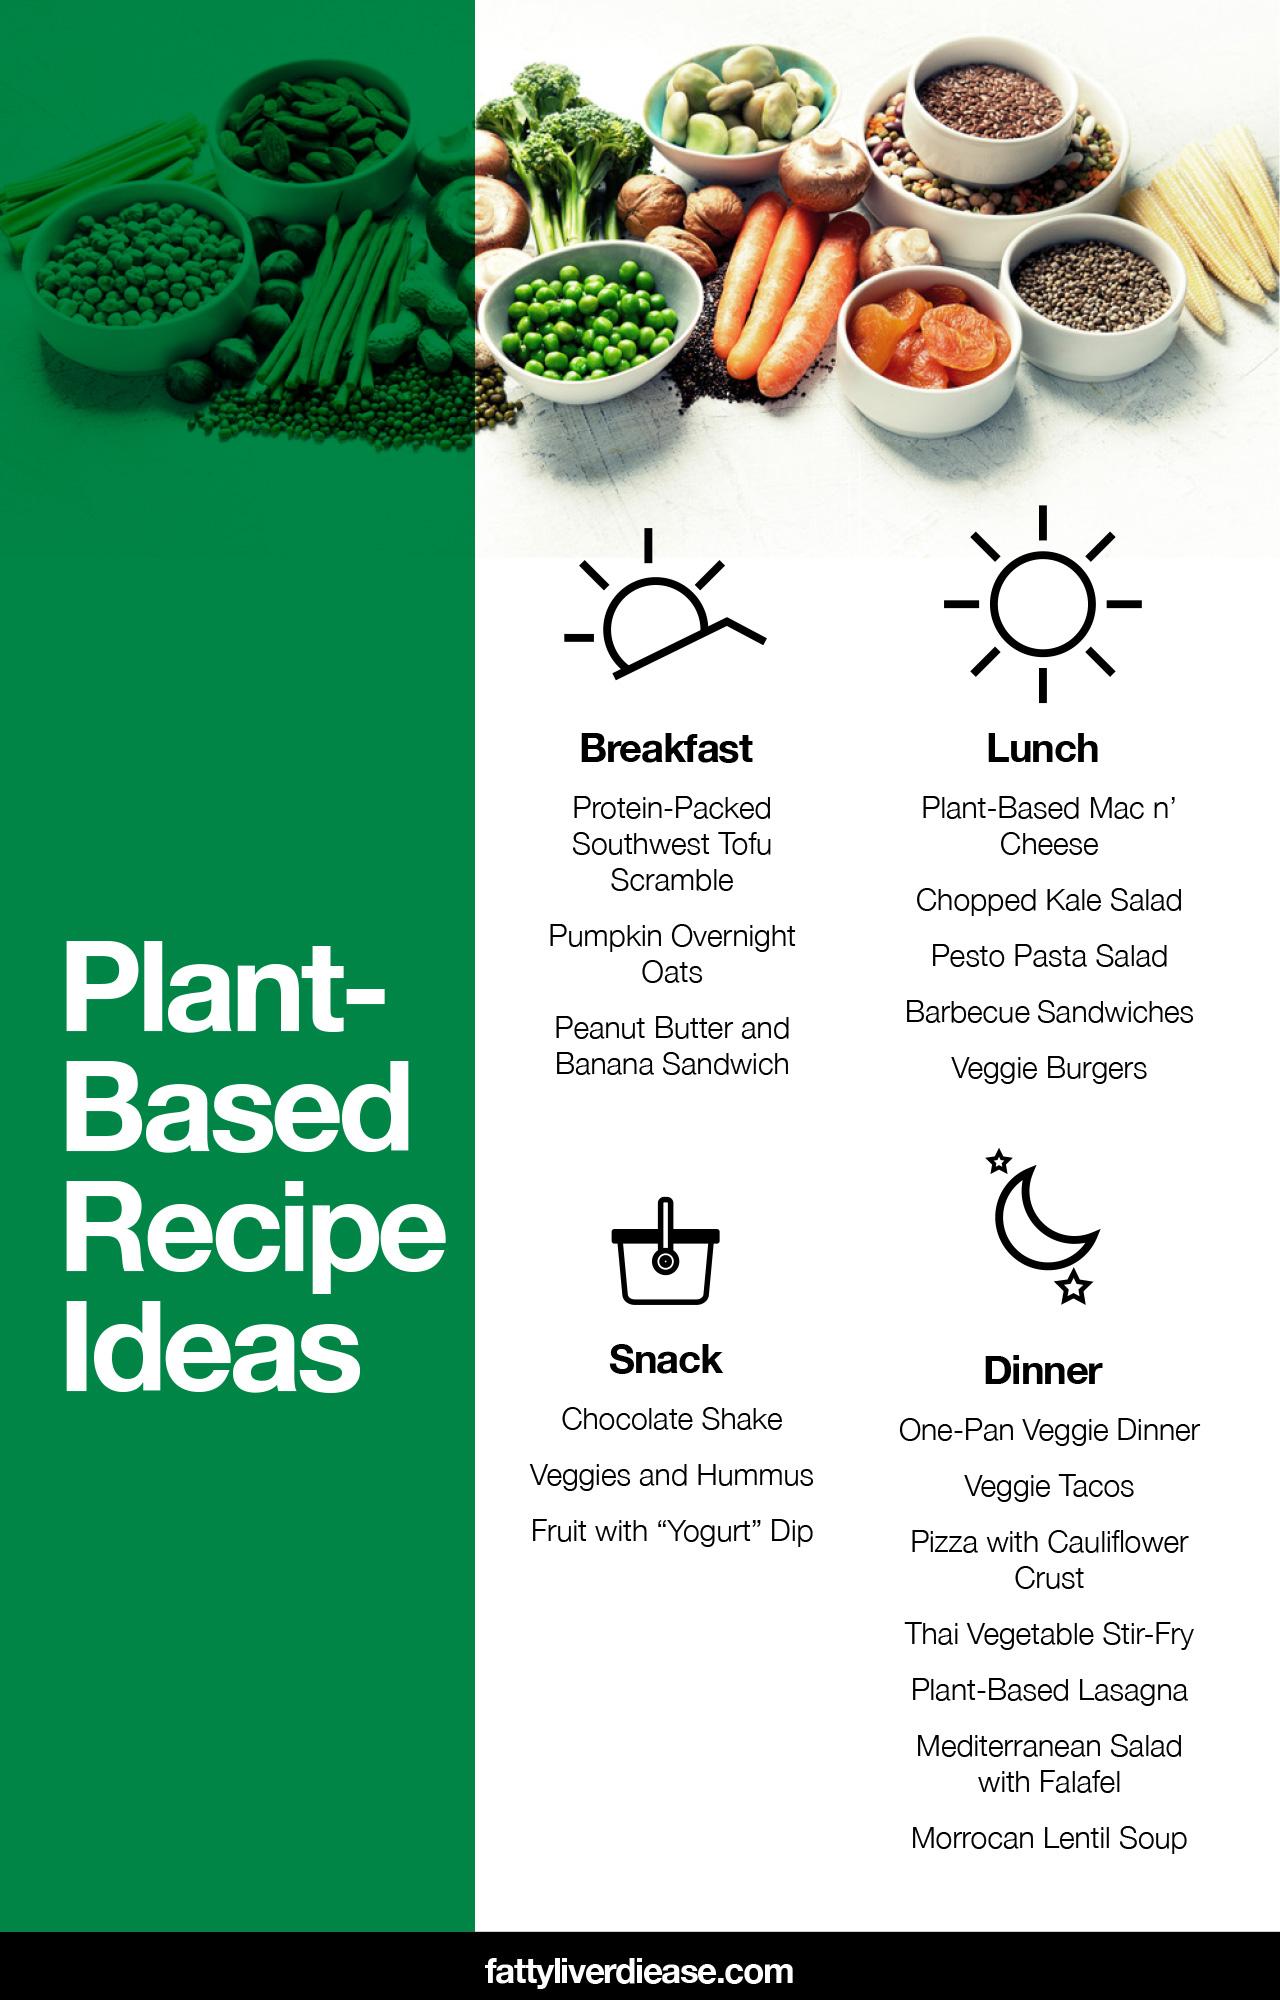 Plant-Based Recipe Ideas